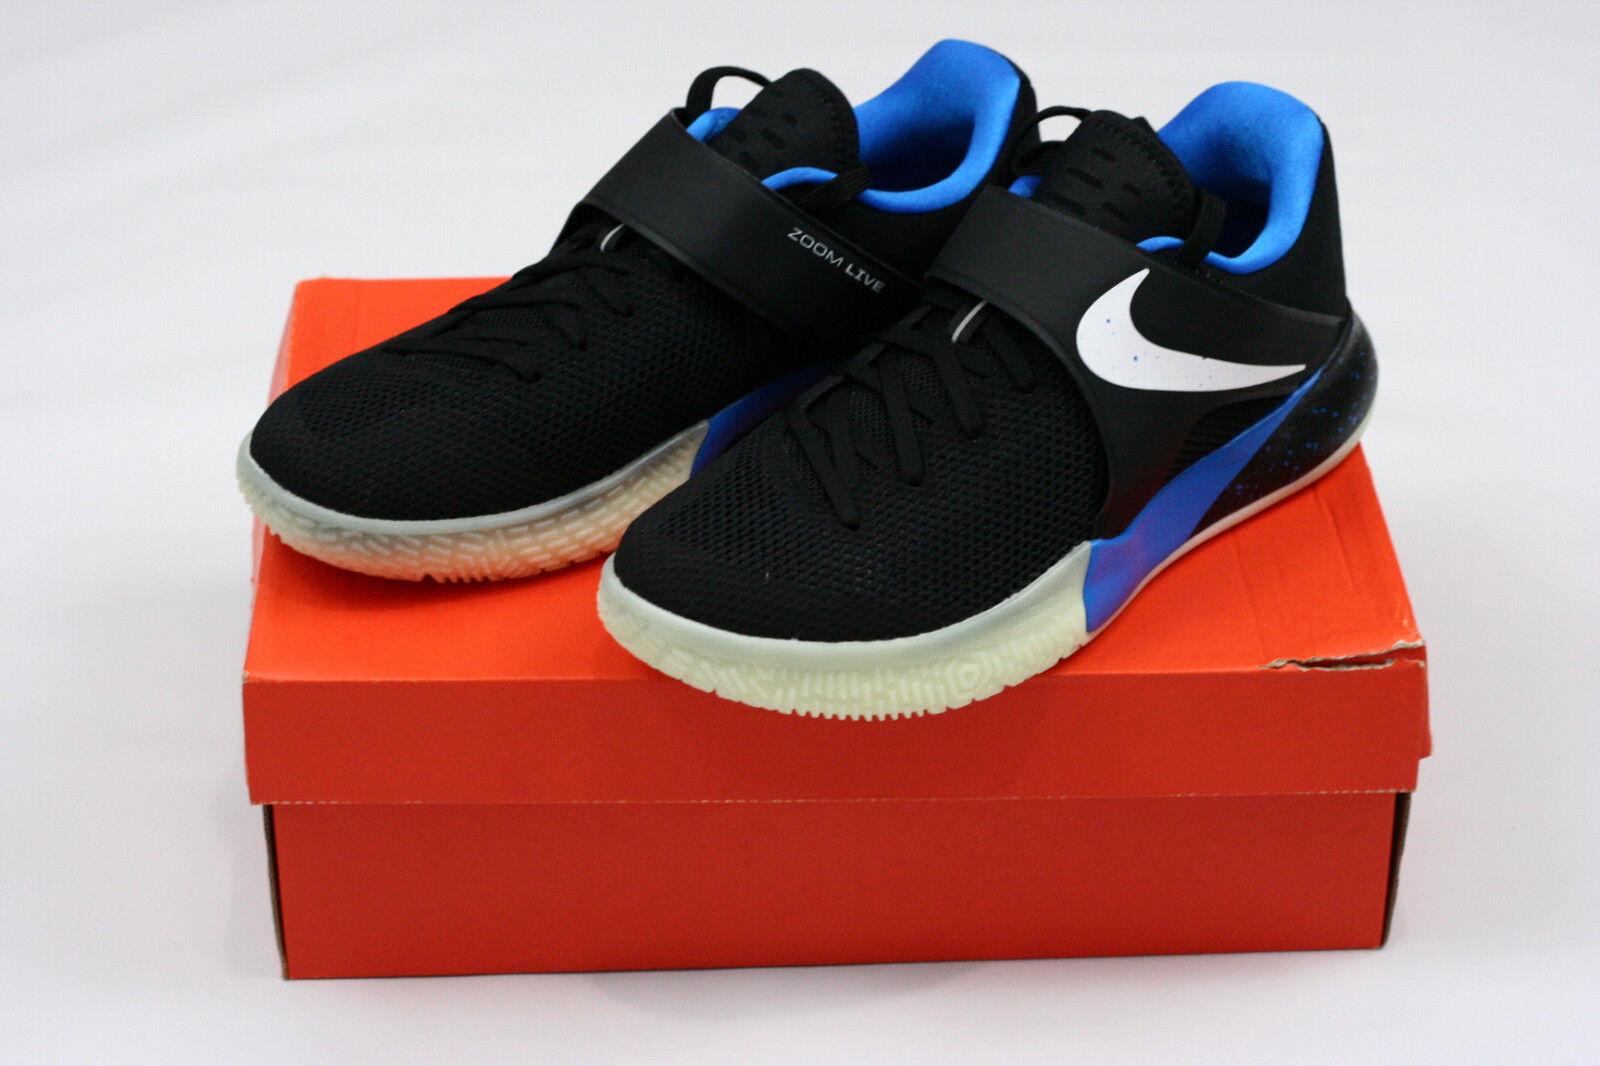 Nike Zoom Live Live Live PE ZACH LAVINE Men's shoes Size 8.5 Black bluee White 910573-014 cbf845